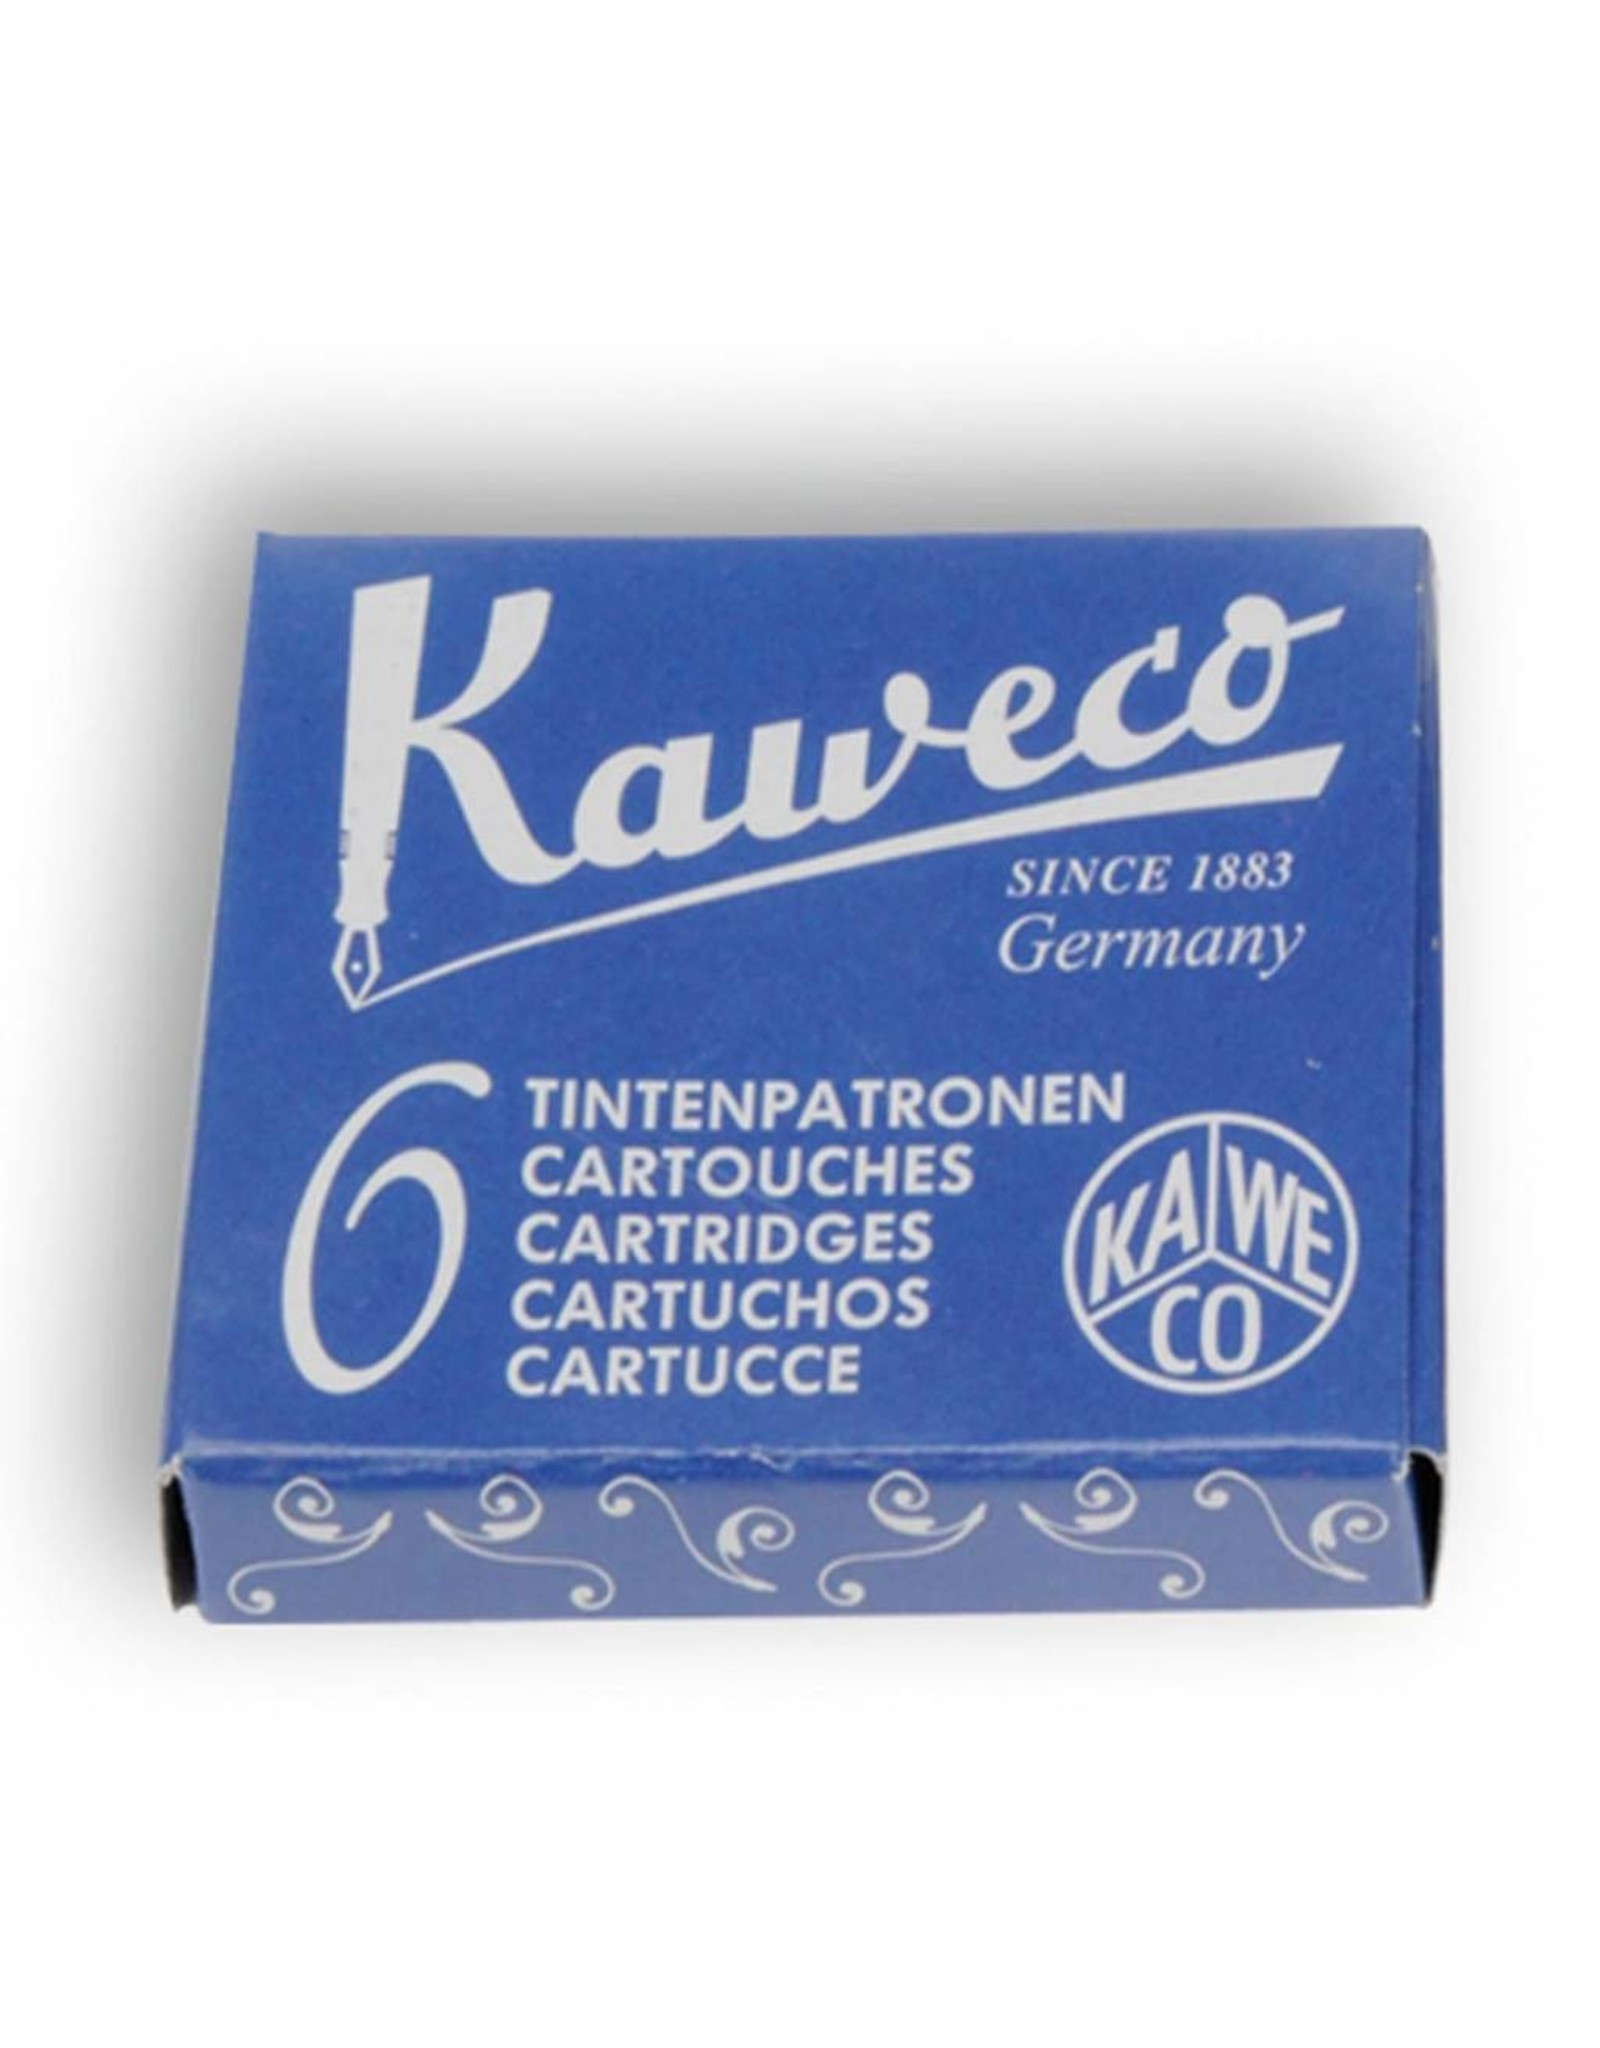 Kaweco vulpen vullingen (6) royal blue